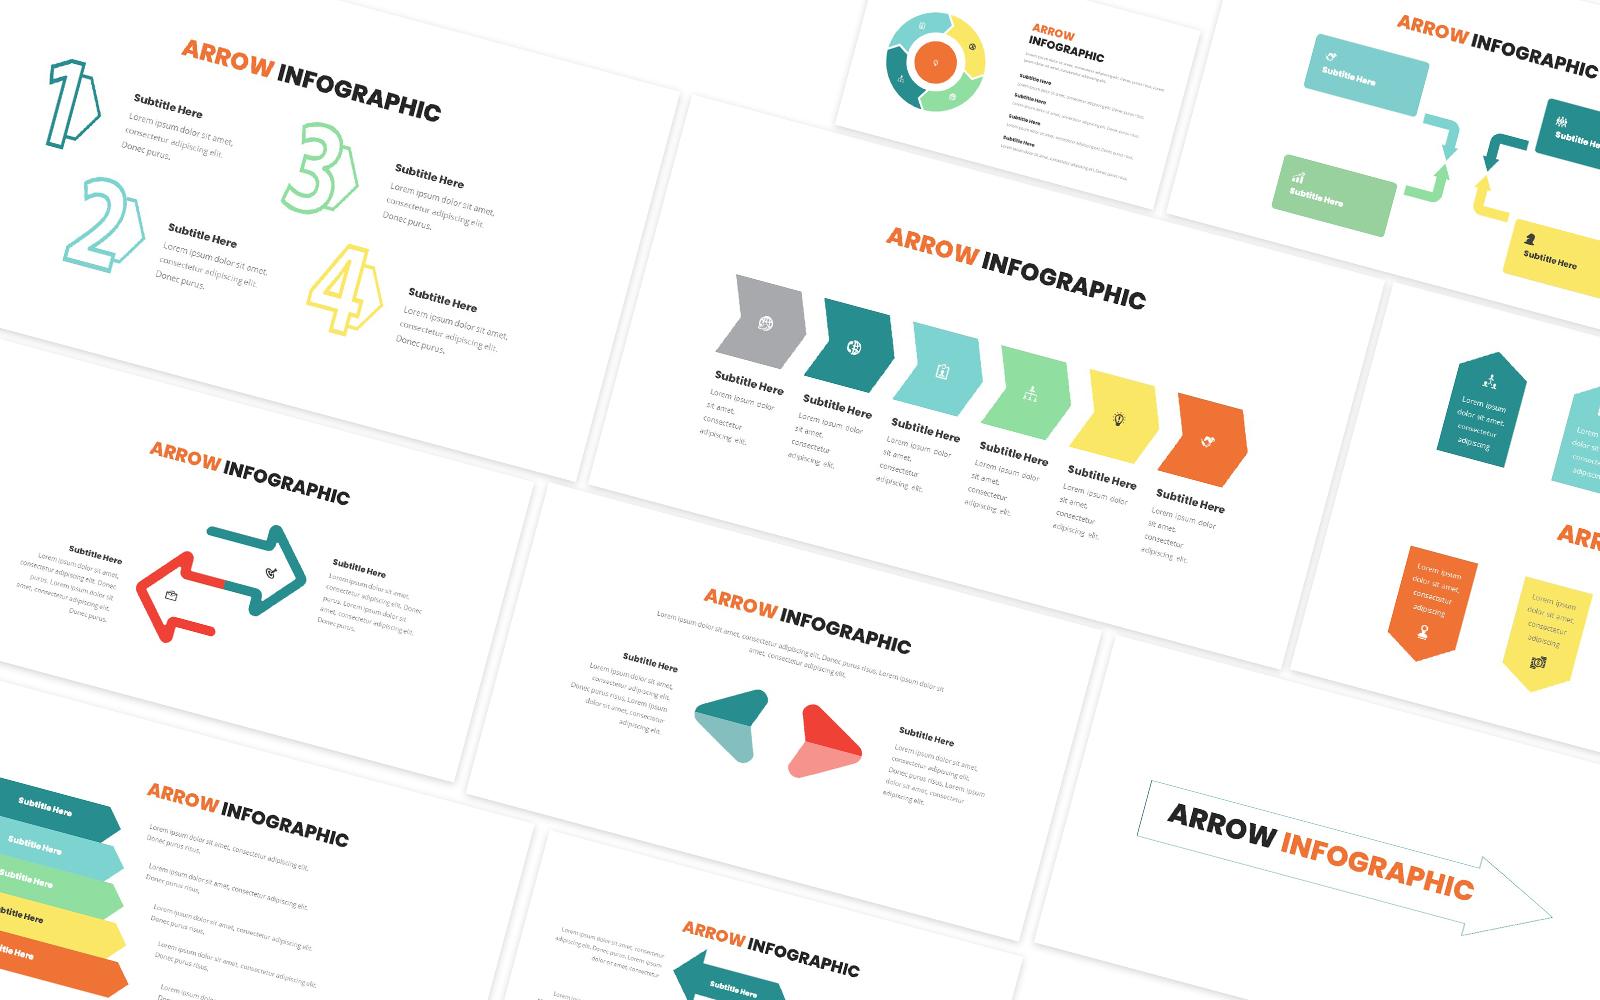 Arrow Infographic Powerpoint